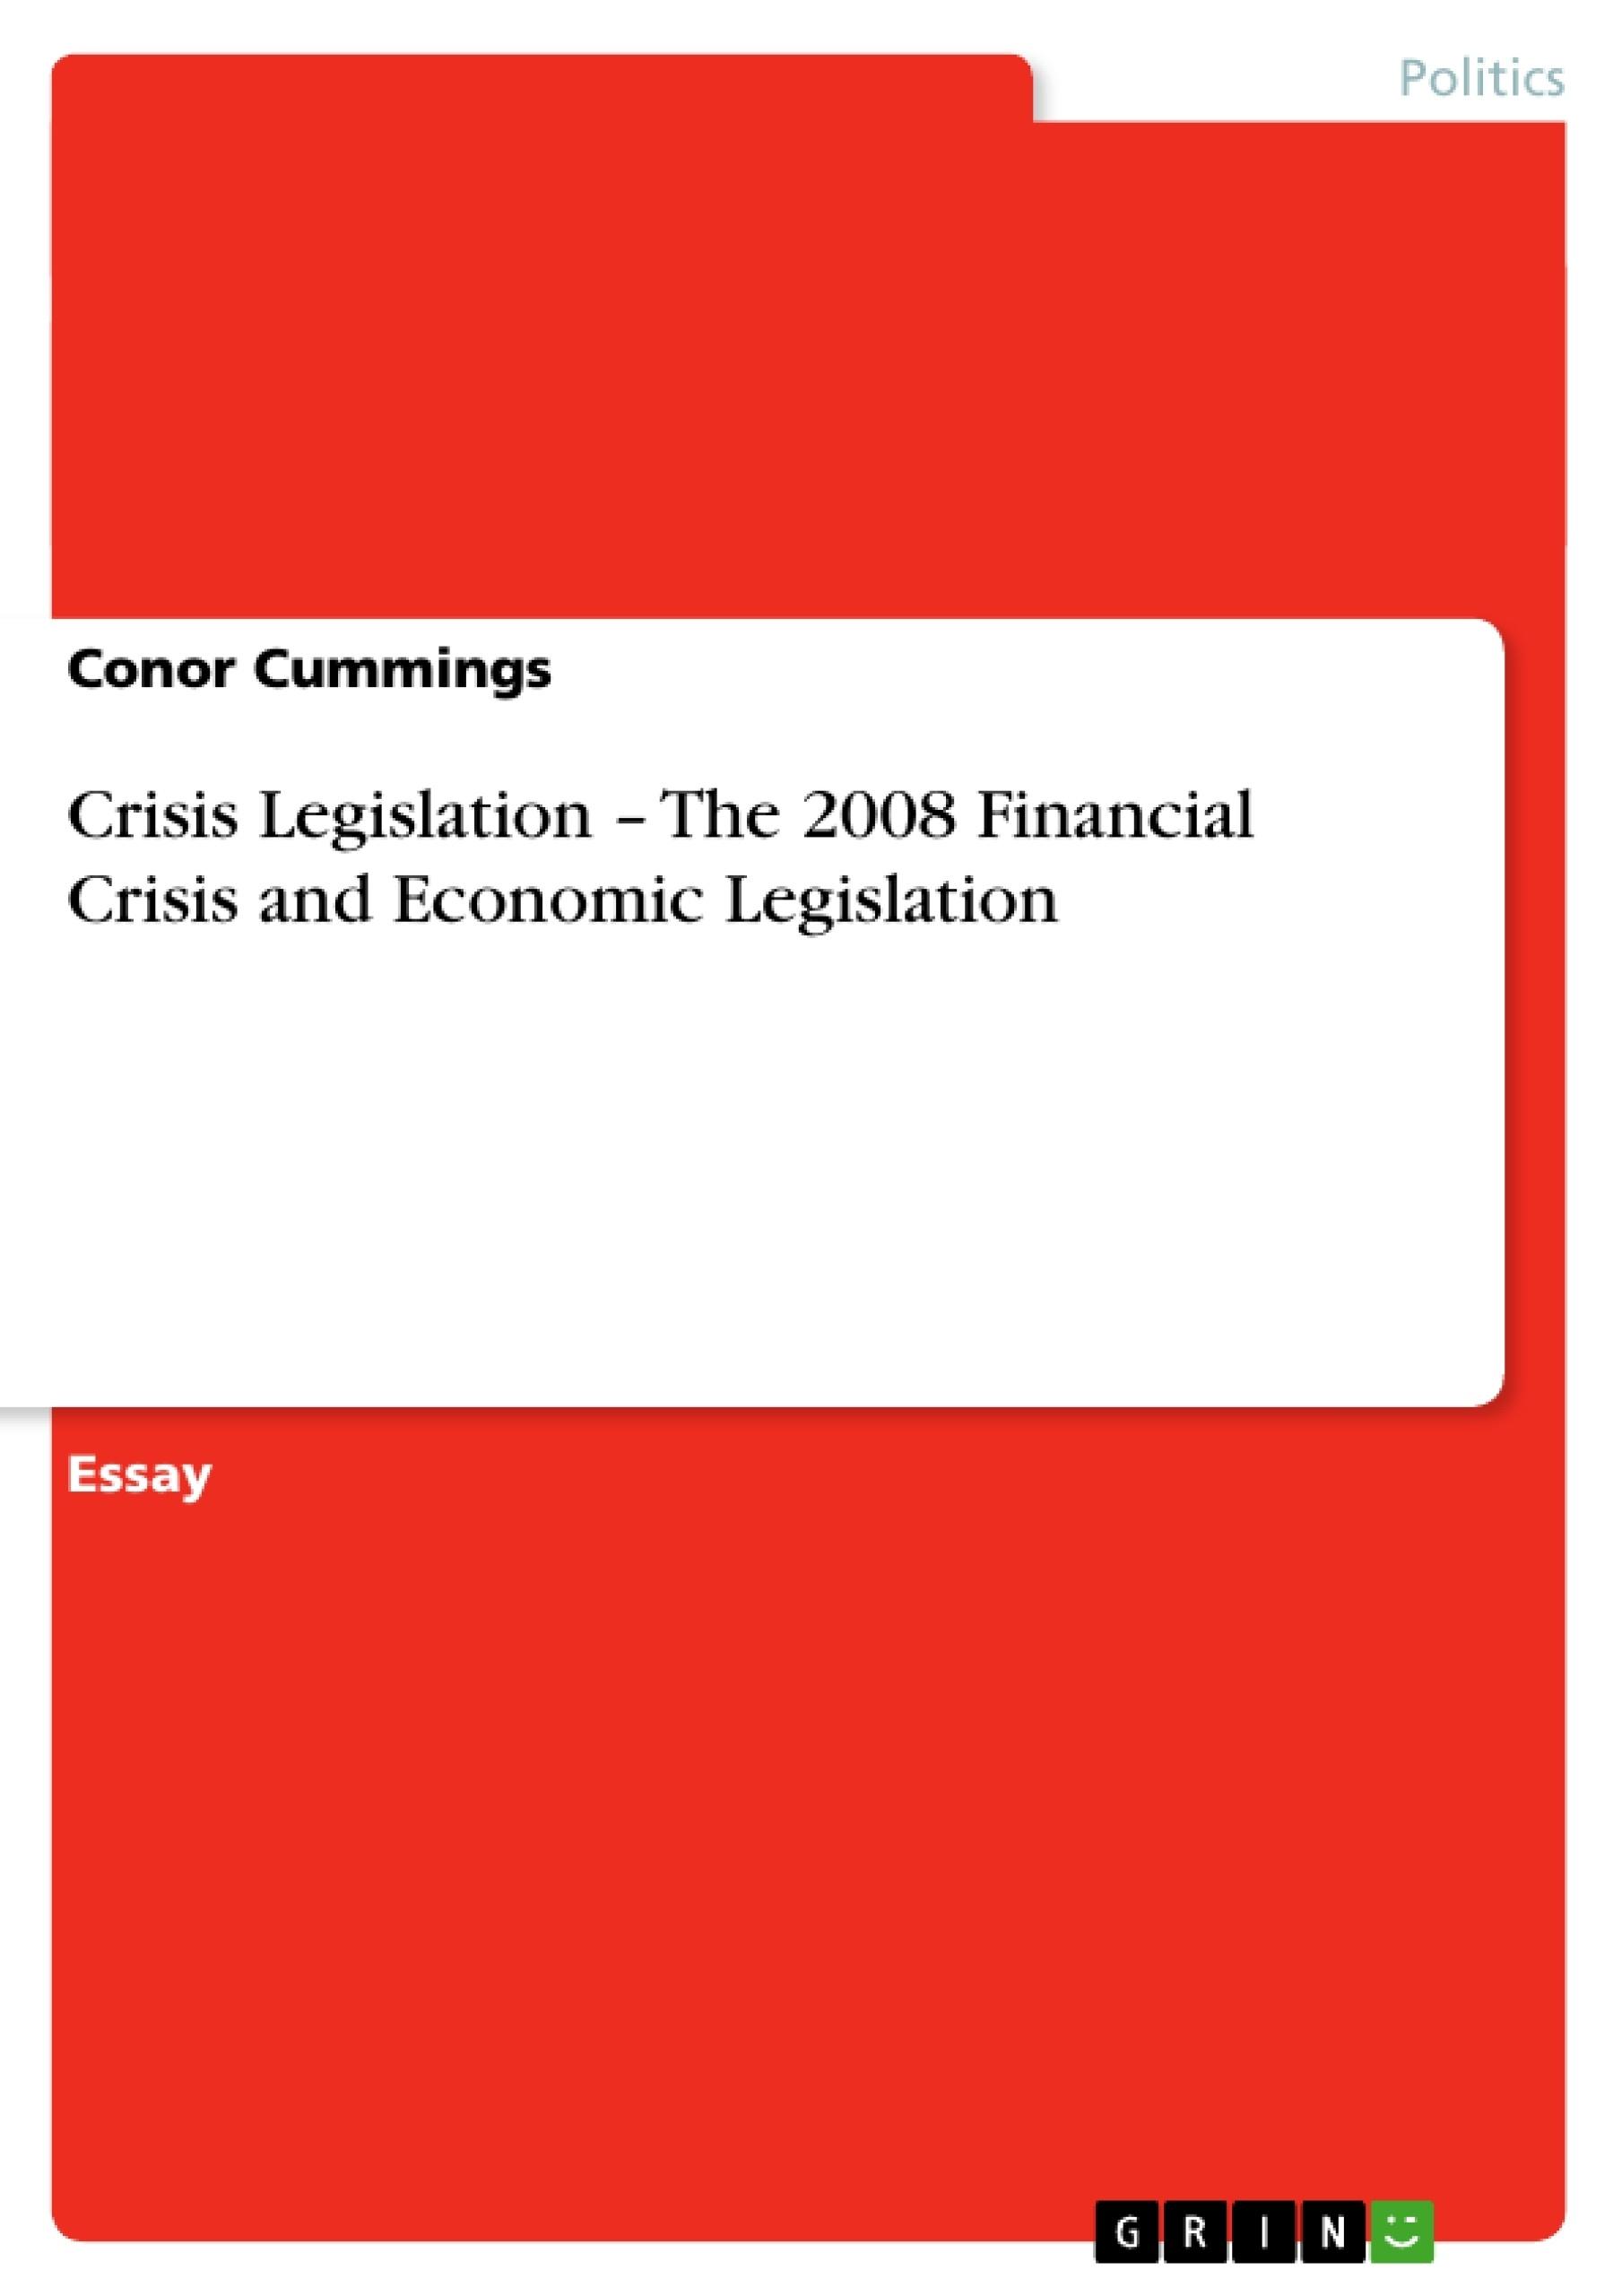 Title: Crisis Legislation – The 2008 Financial Crisis and Economic Legislation